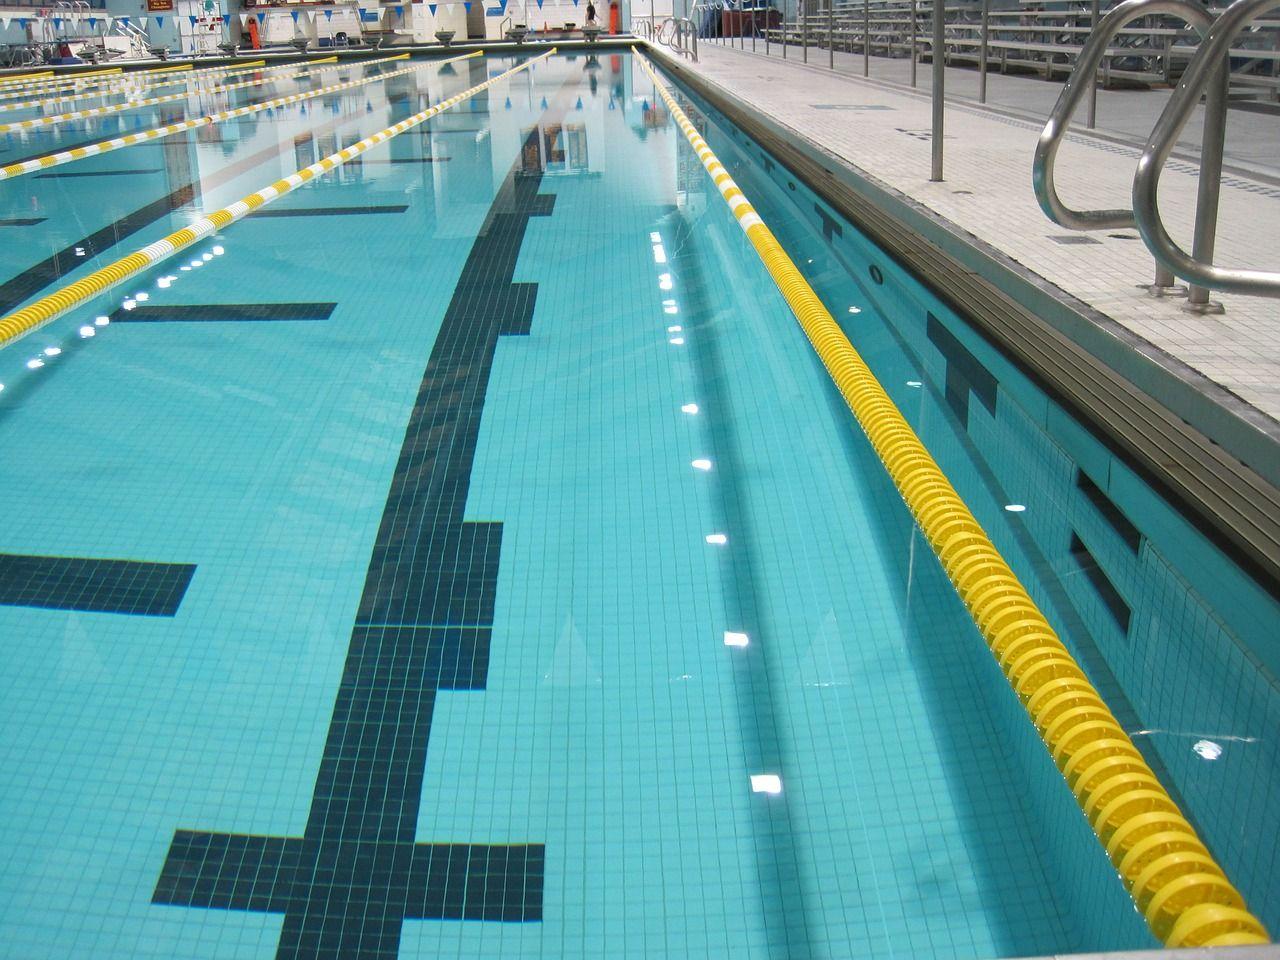 Pool Plastering Near Me In 2020 Pool Plaster How To Get Abs Pool